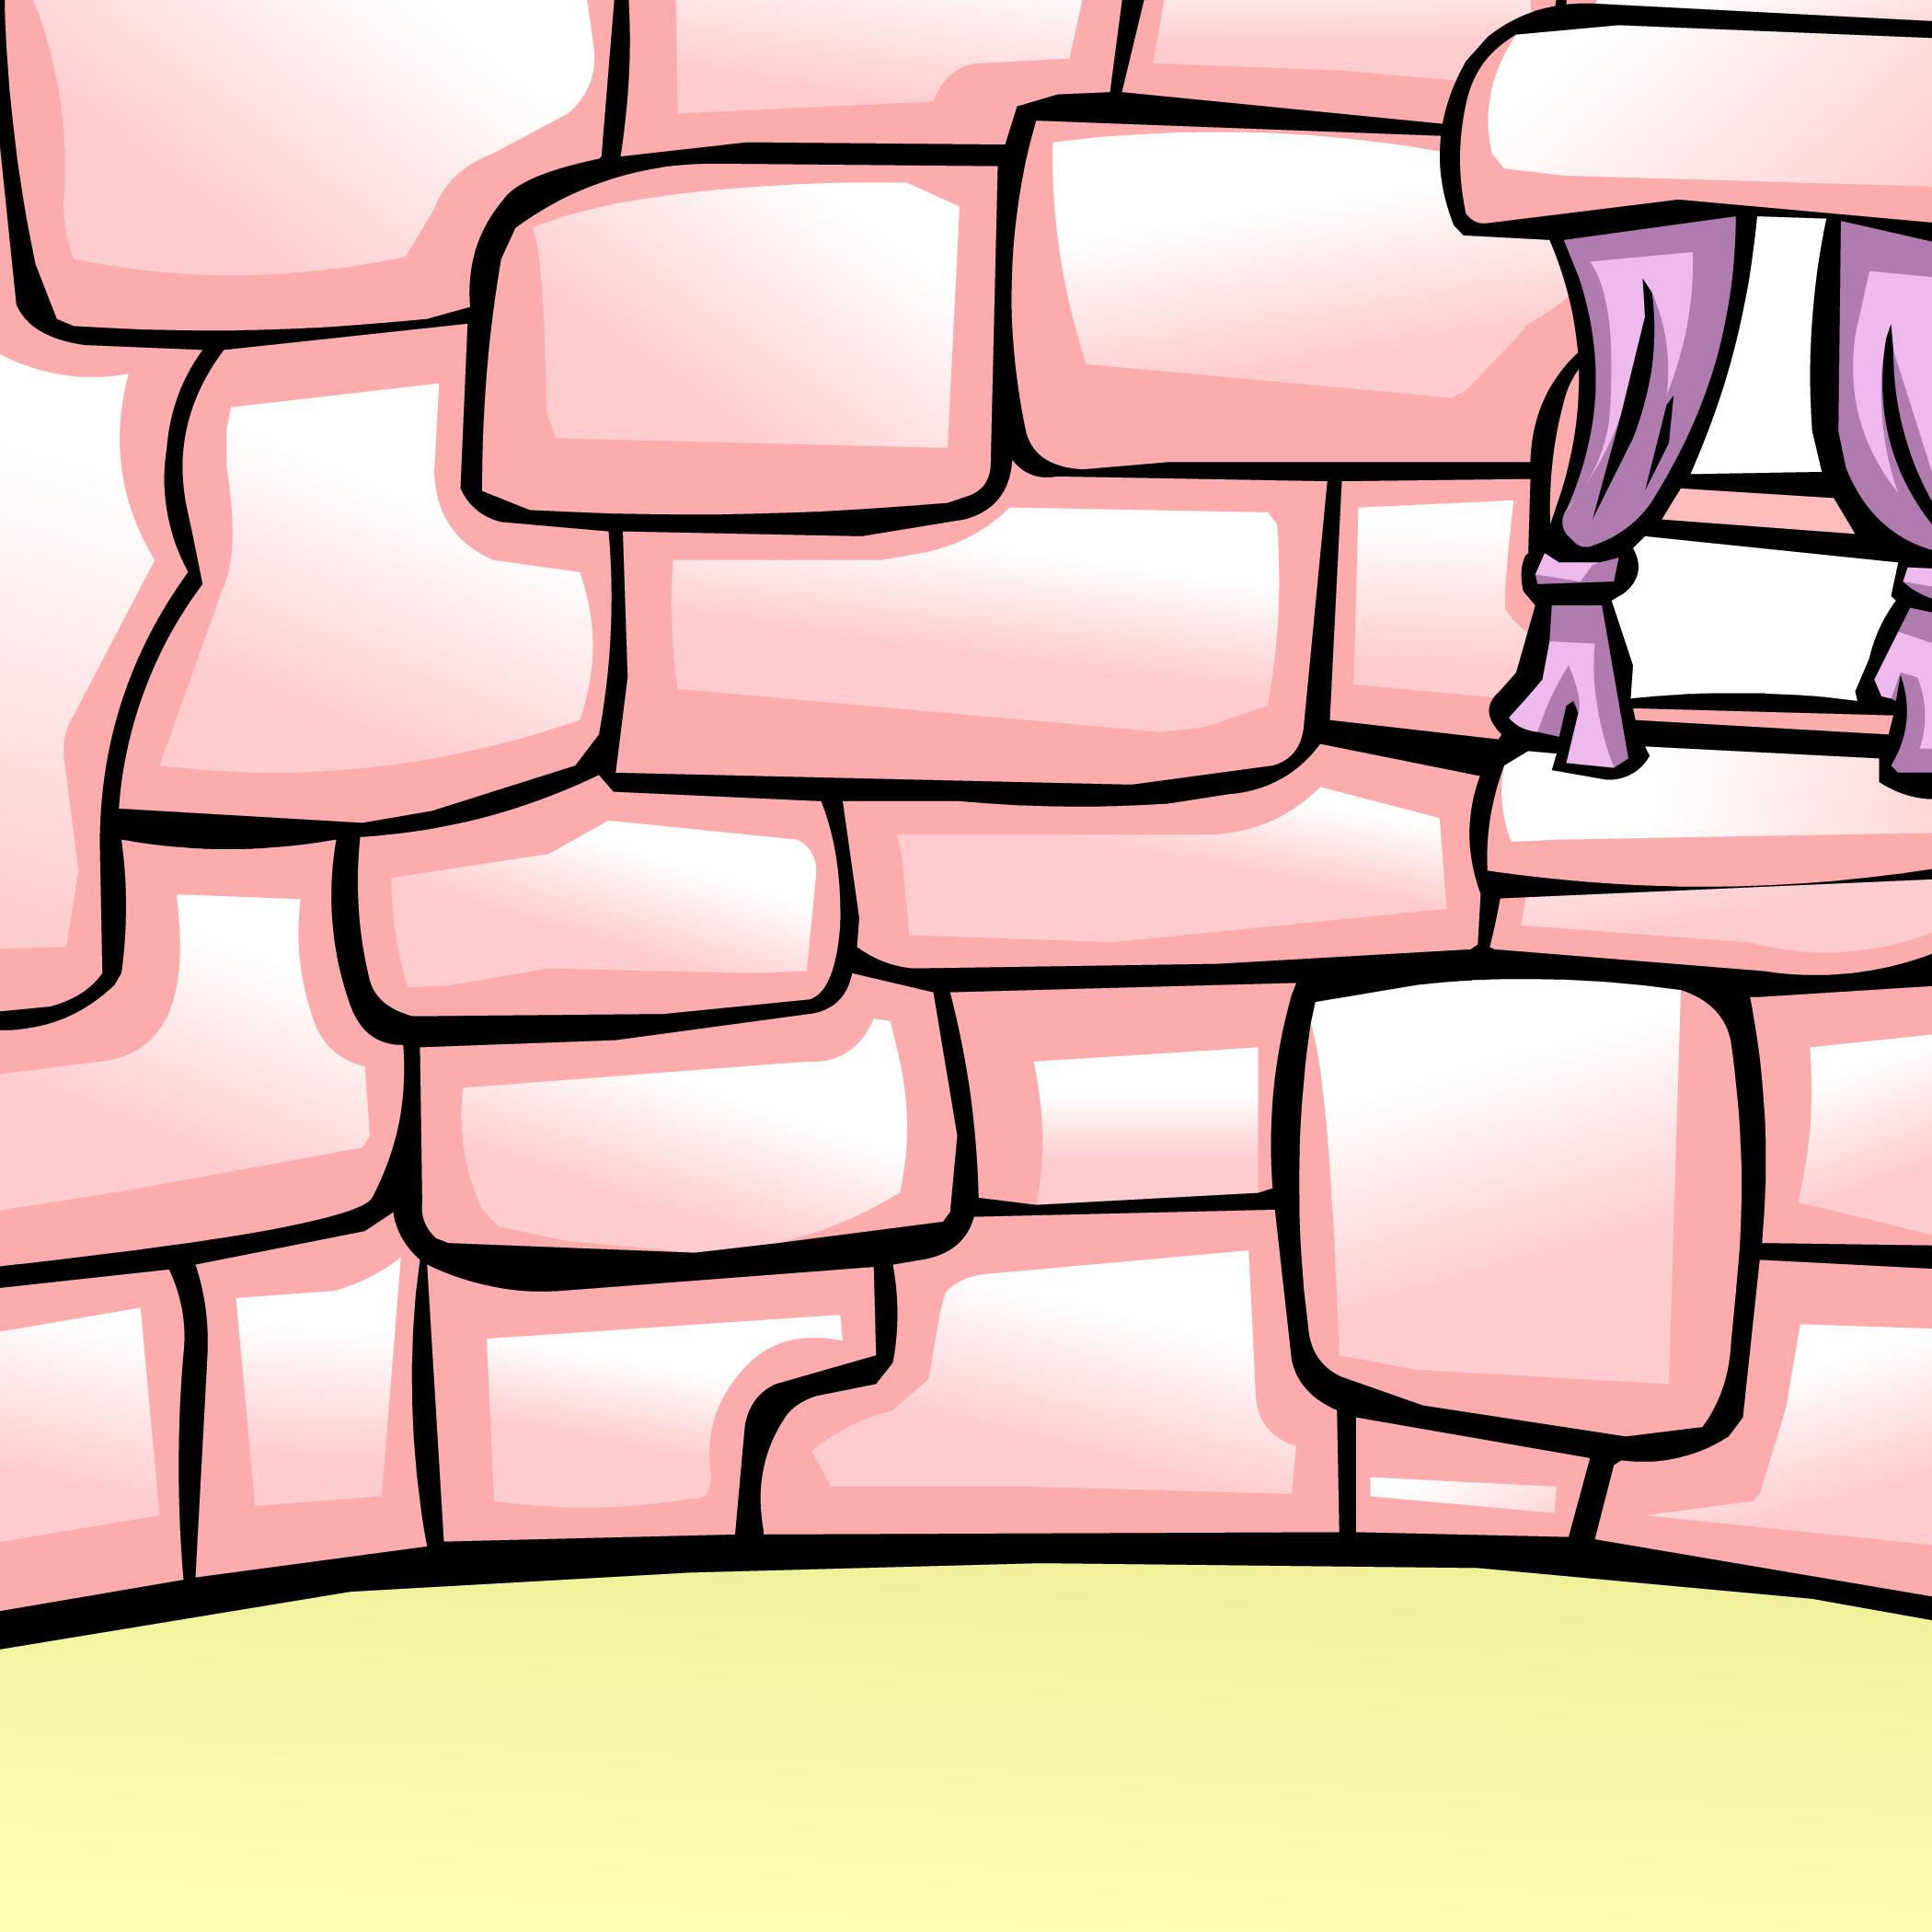 Candy Igloo Background